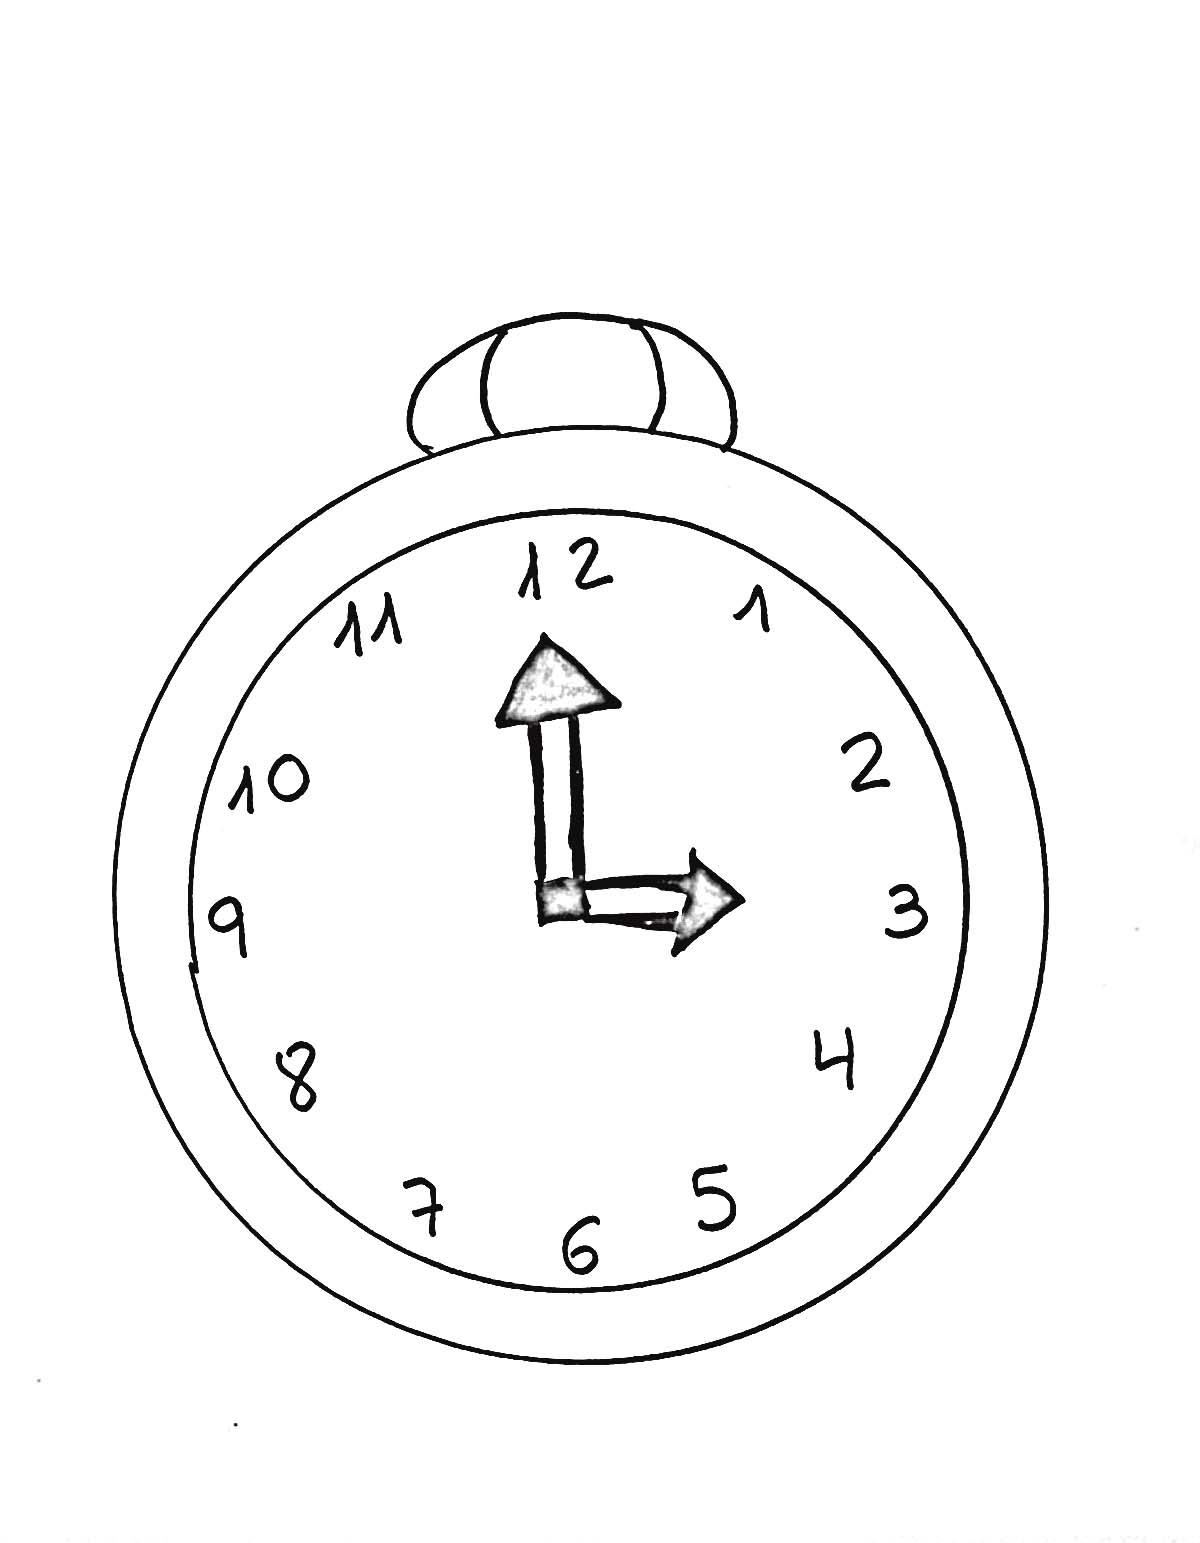 Reloj de pared para colorear - Imagui